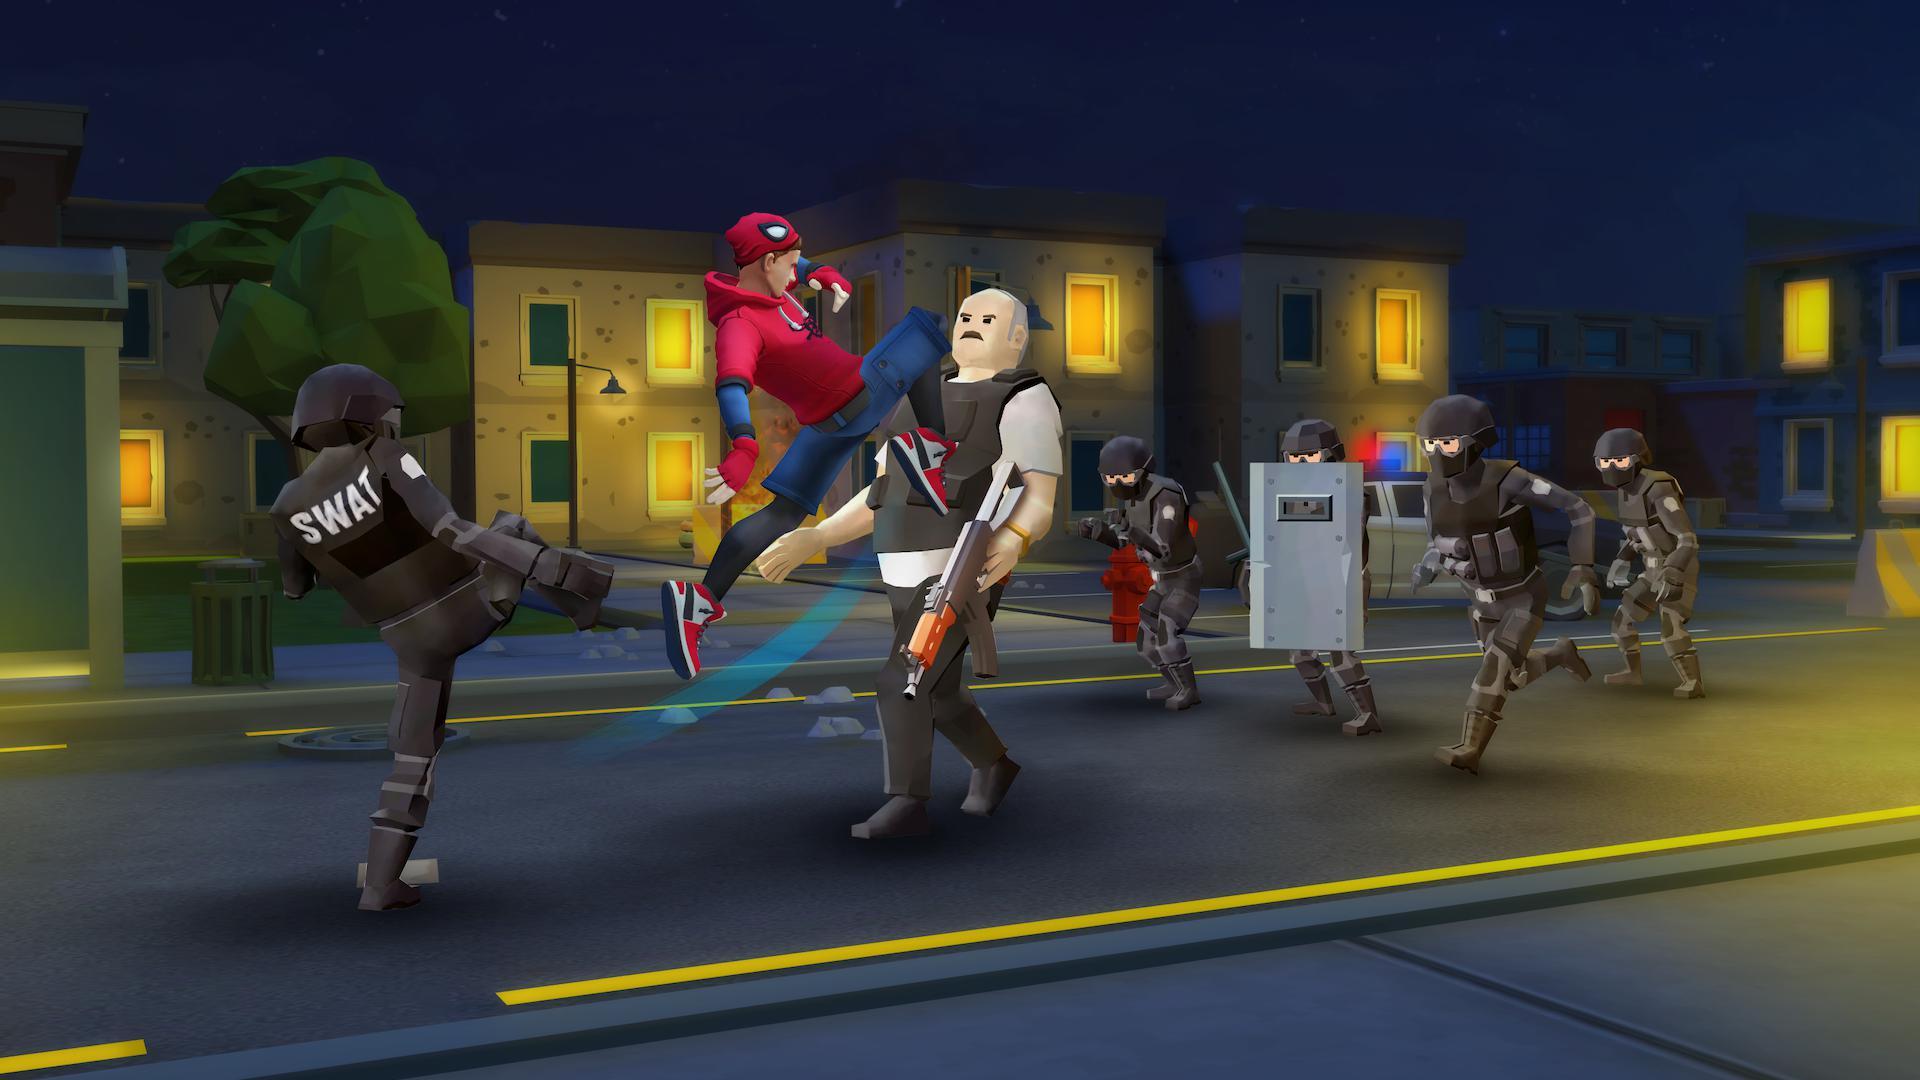 Spider Fighter: Superhero Revenge 游戏截图5